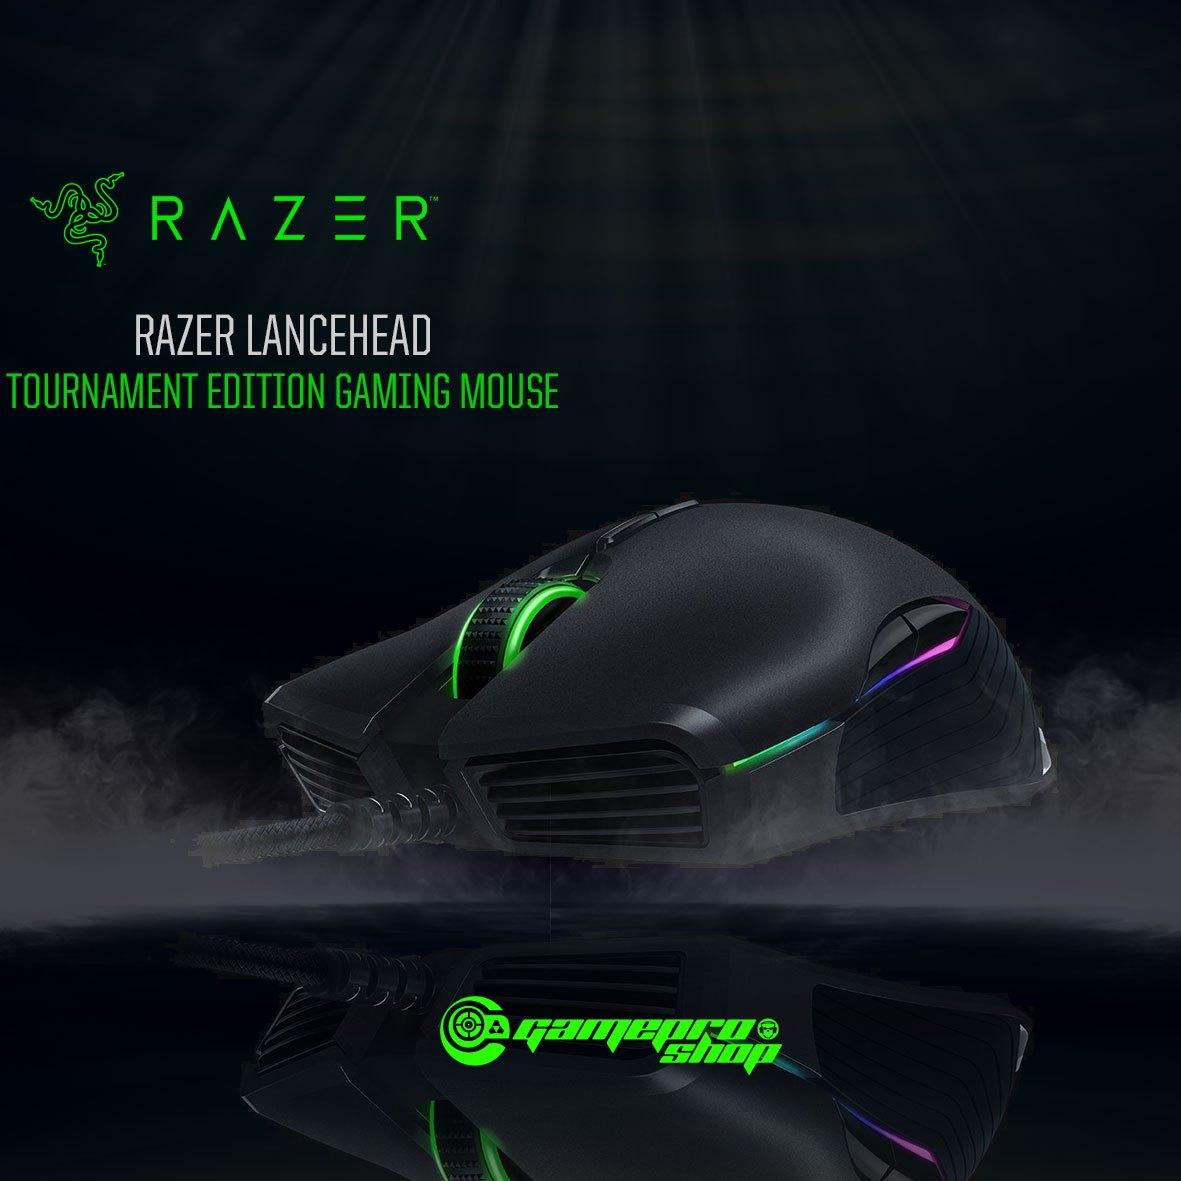 Razer Lancehead Tournament Edition Gaming Mouse GamePro Shop